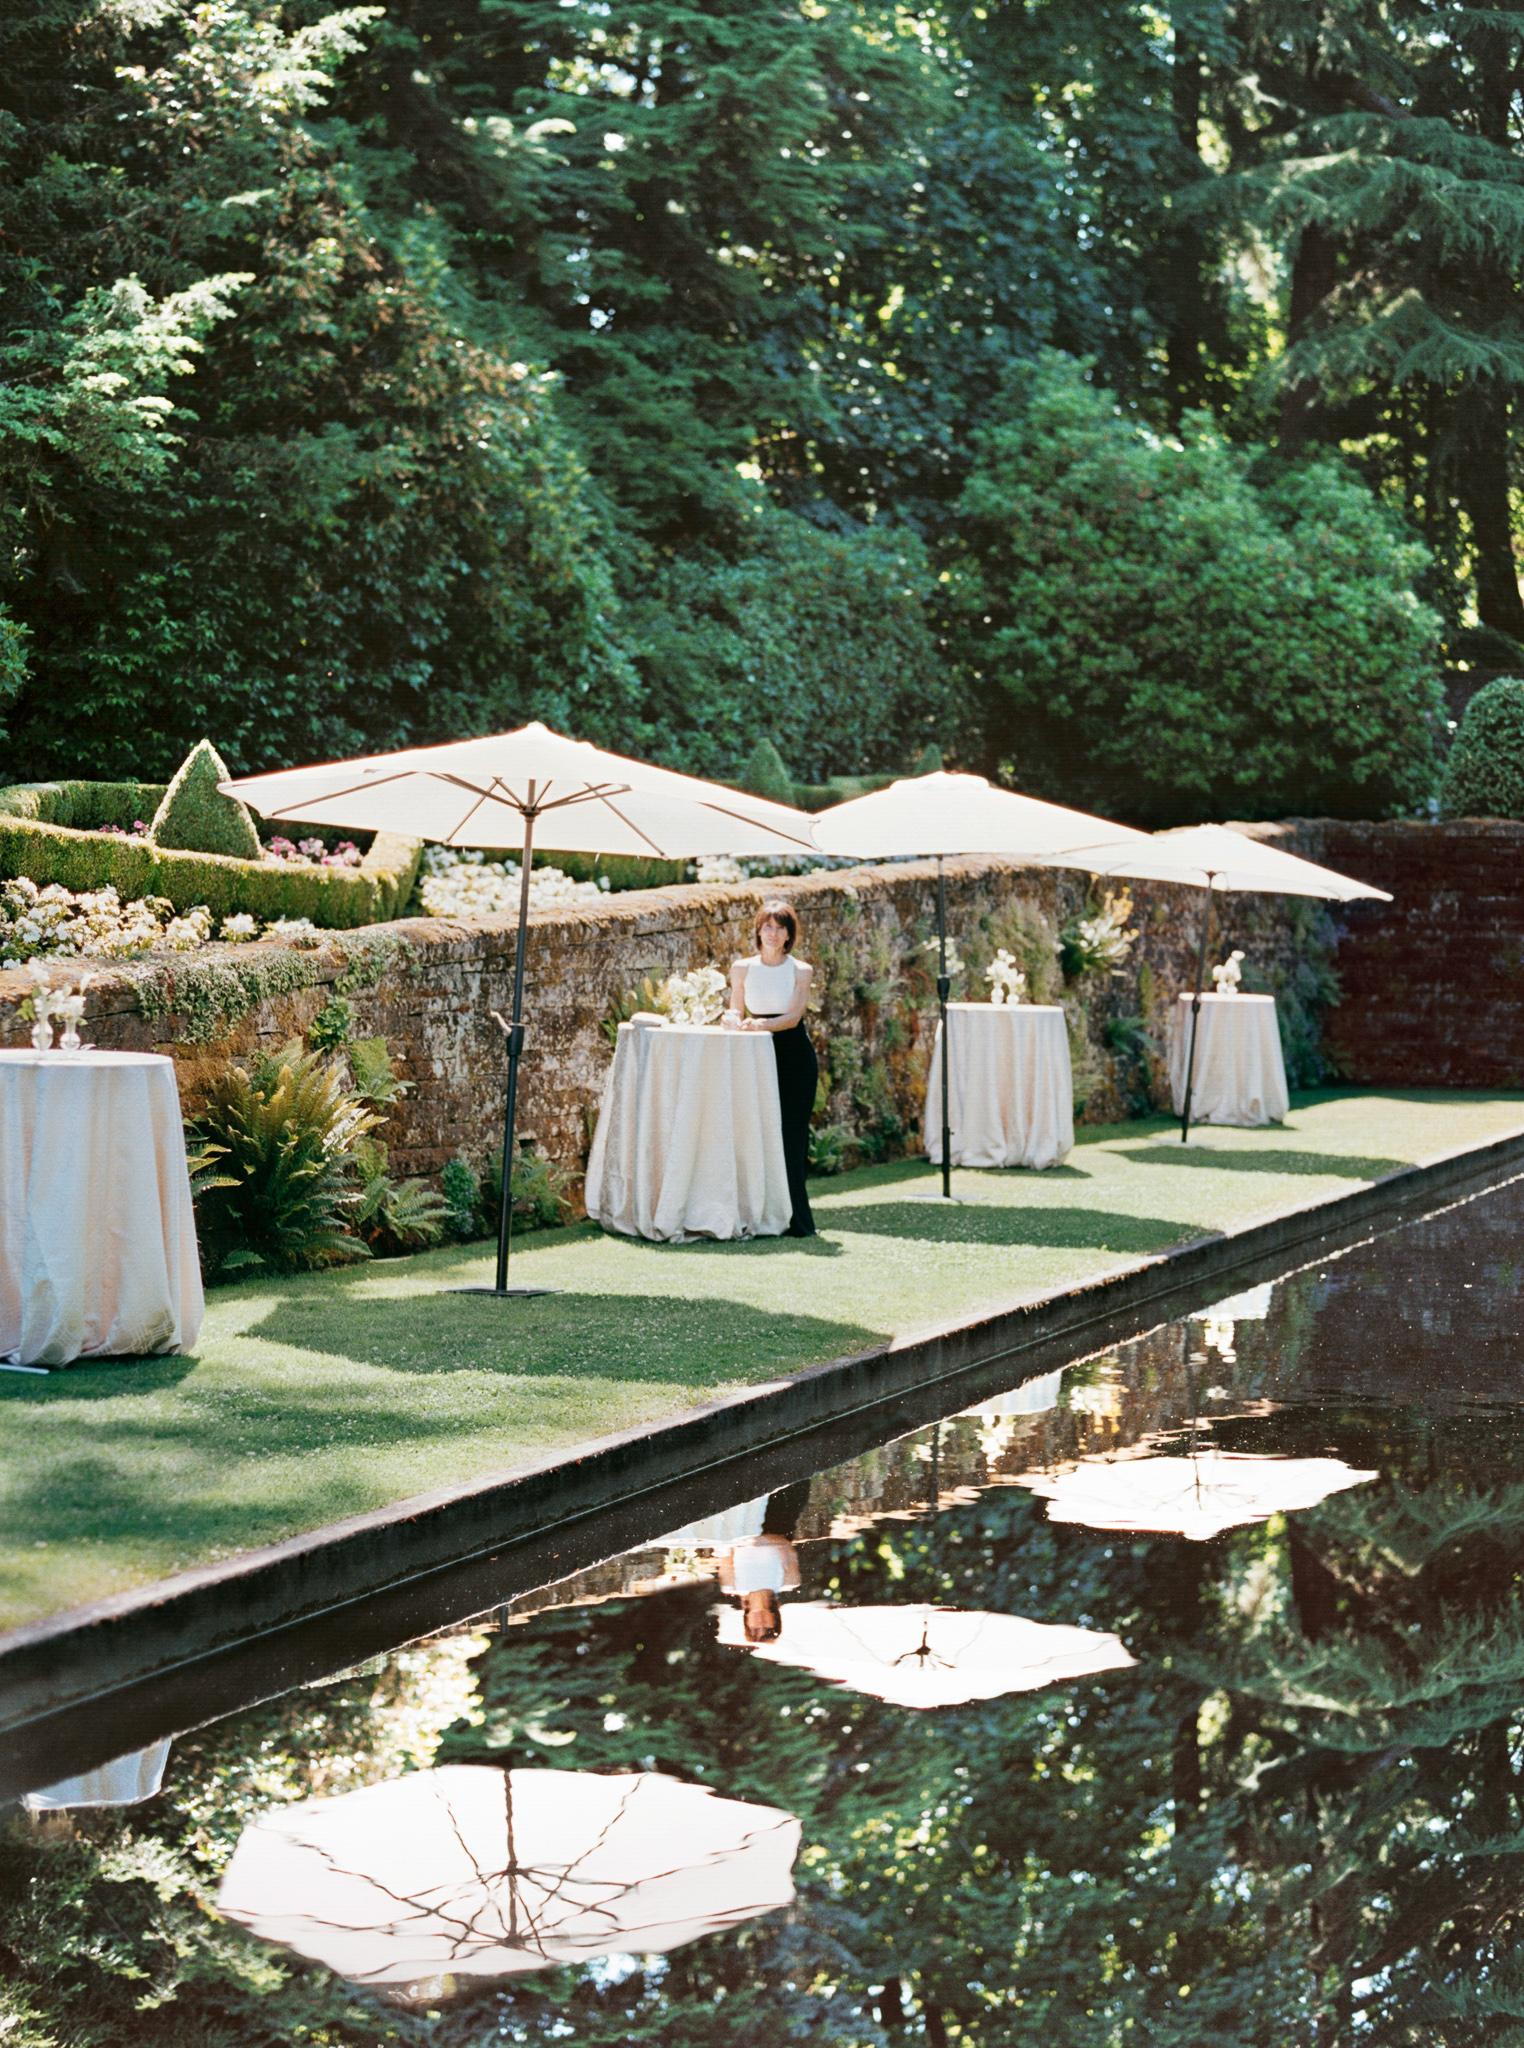 150OutliveCreative_Travel_Photographer_Videographer_Lewis&Clark_Oregon_Elegant_BlackTie_Destination_Wedding.jpg